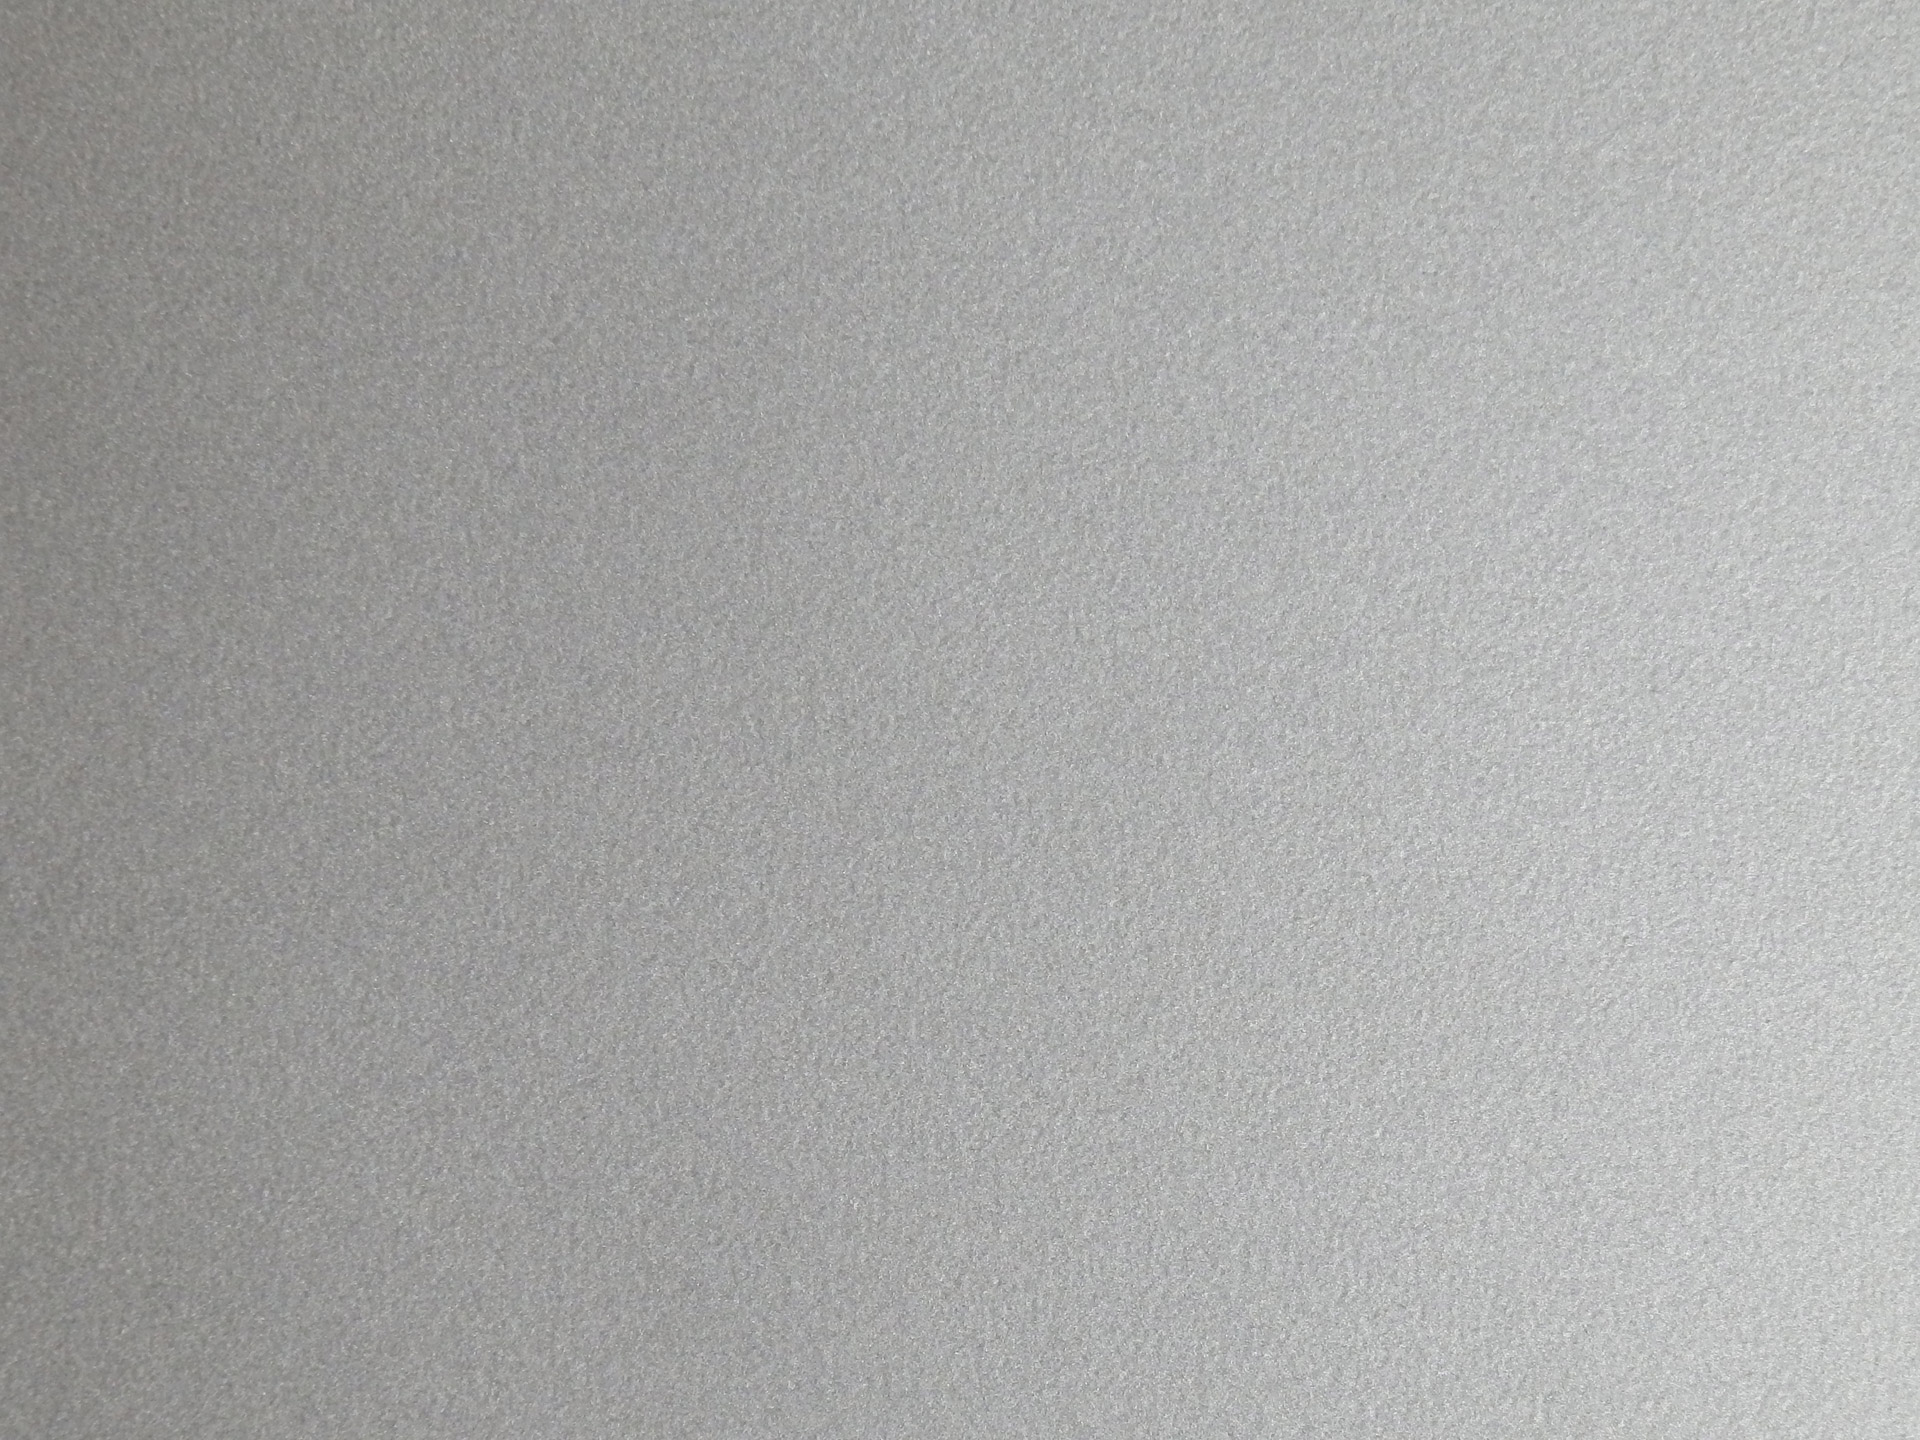 Grey,gray,metal,metallic,texture